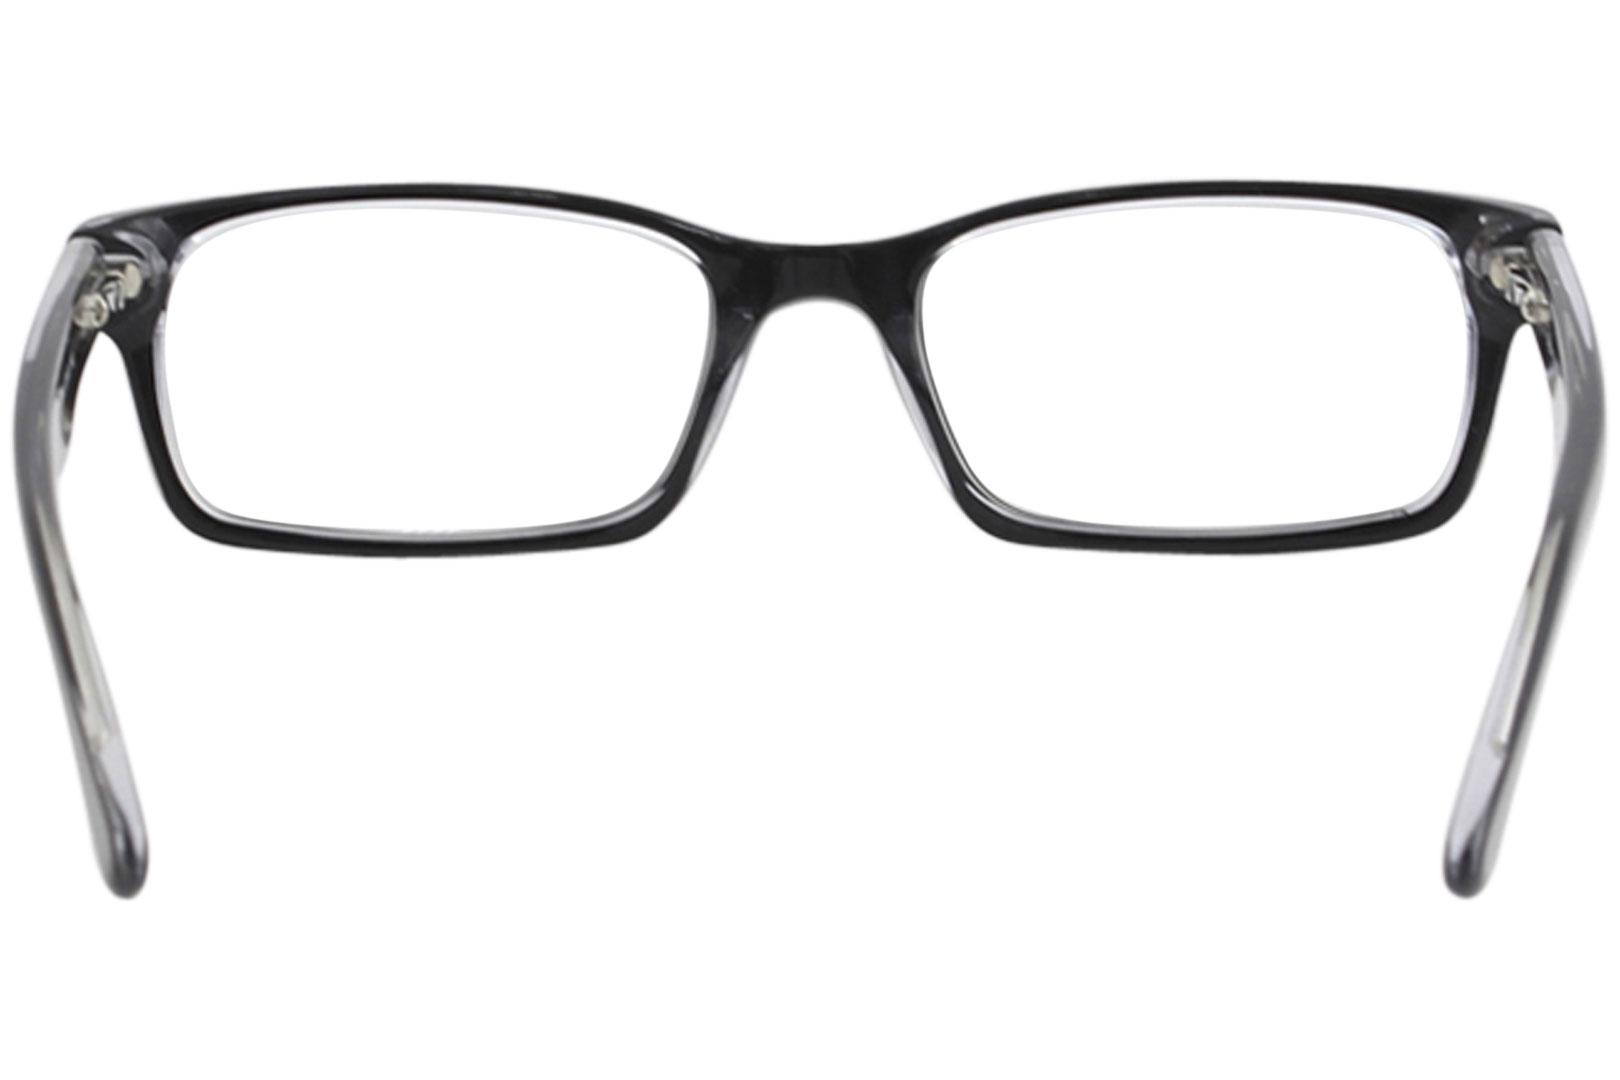 0cf5279057 Ray Ban Eyeglasses RB5206 RB 5206 RayBan Full Rim Optical Frame by Ray Ban.  12345